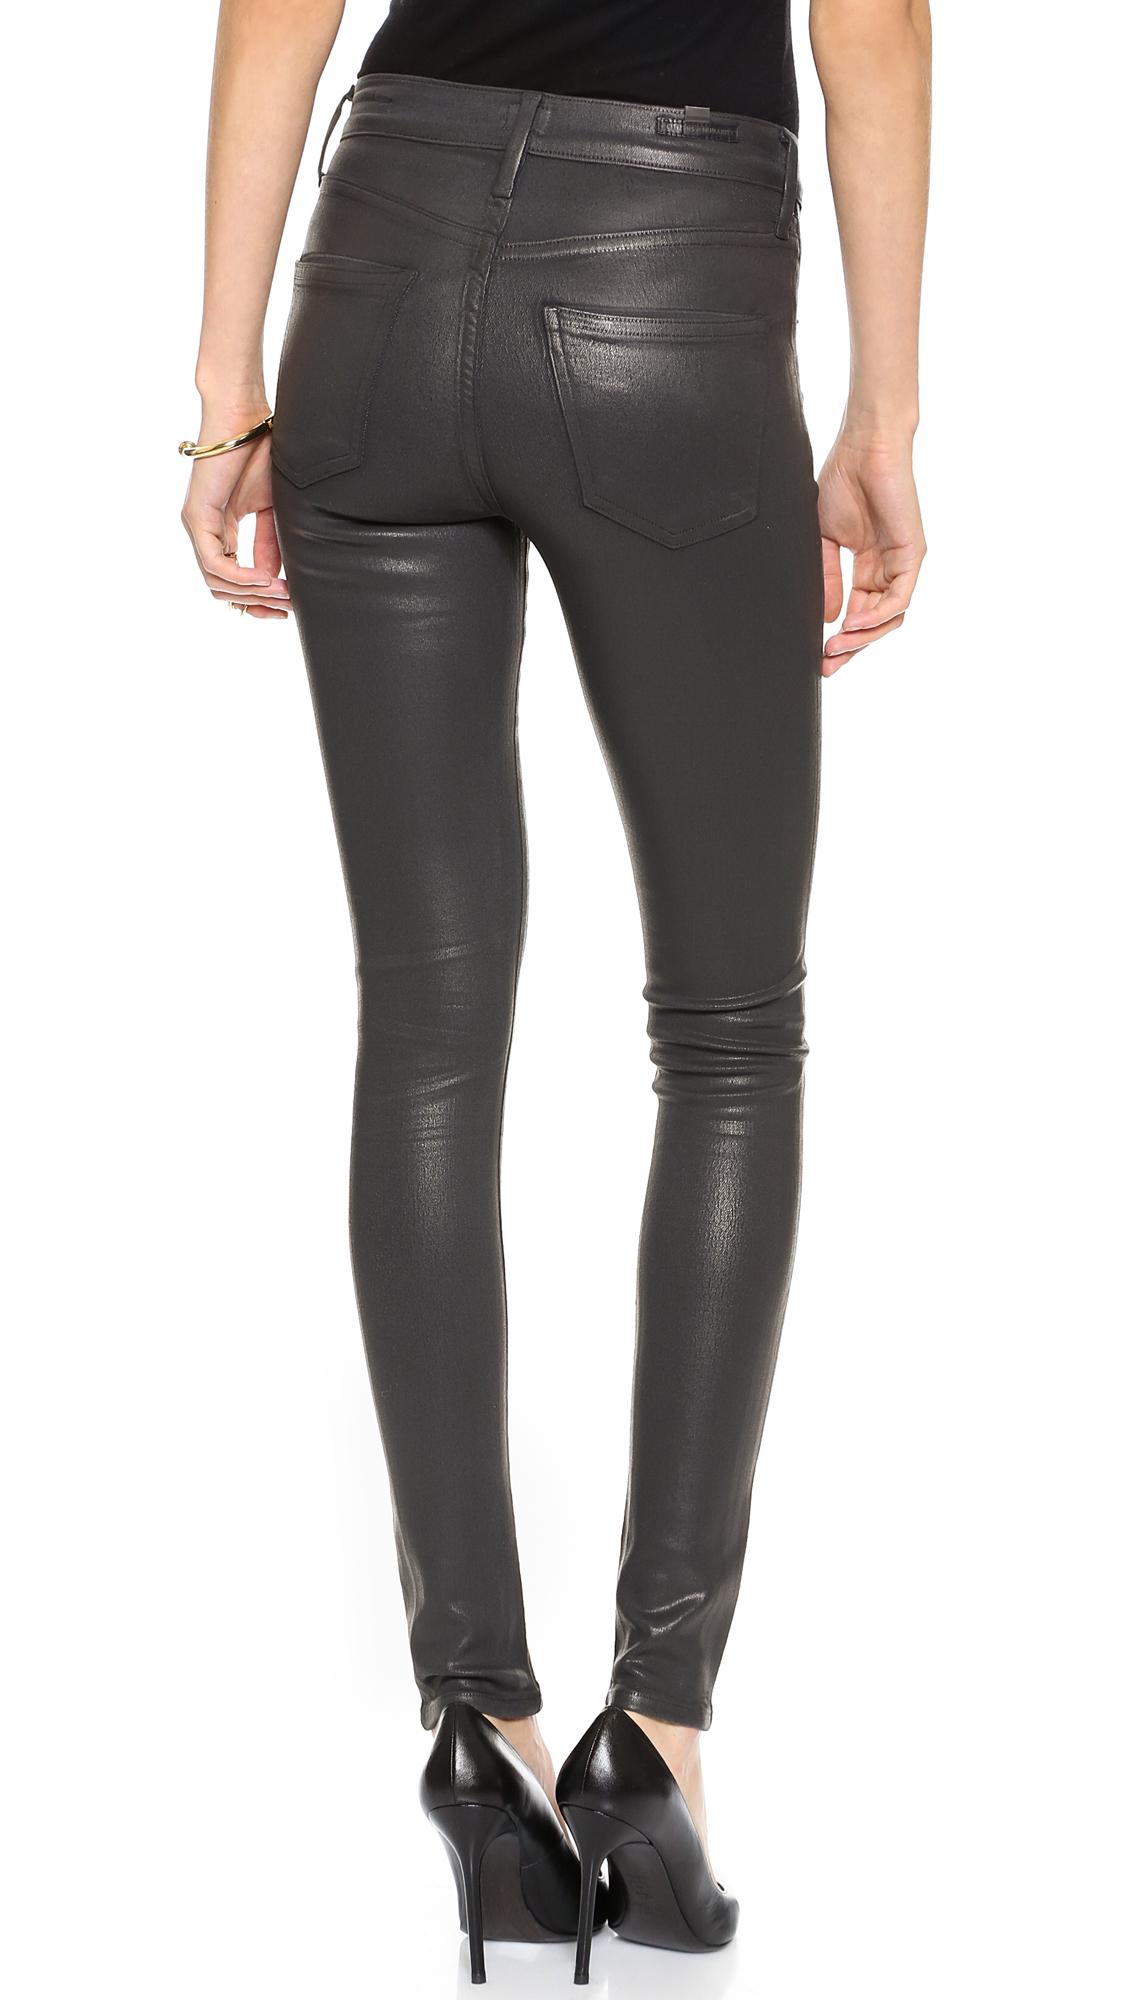 citizens of humanity rocket leatherette coated jeans. Black Bedroom Furniture Sets. Home Design Ideas